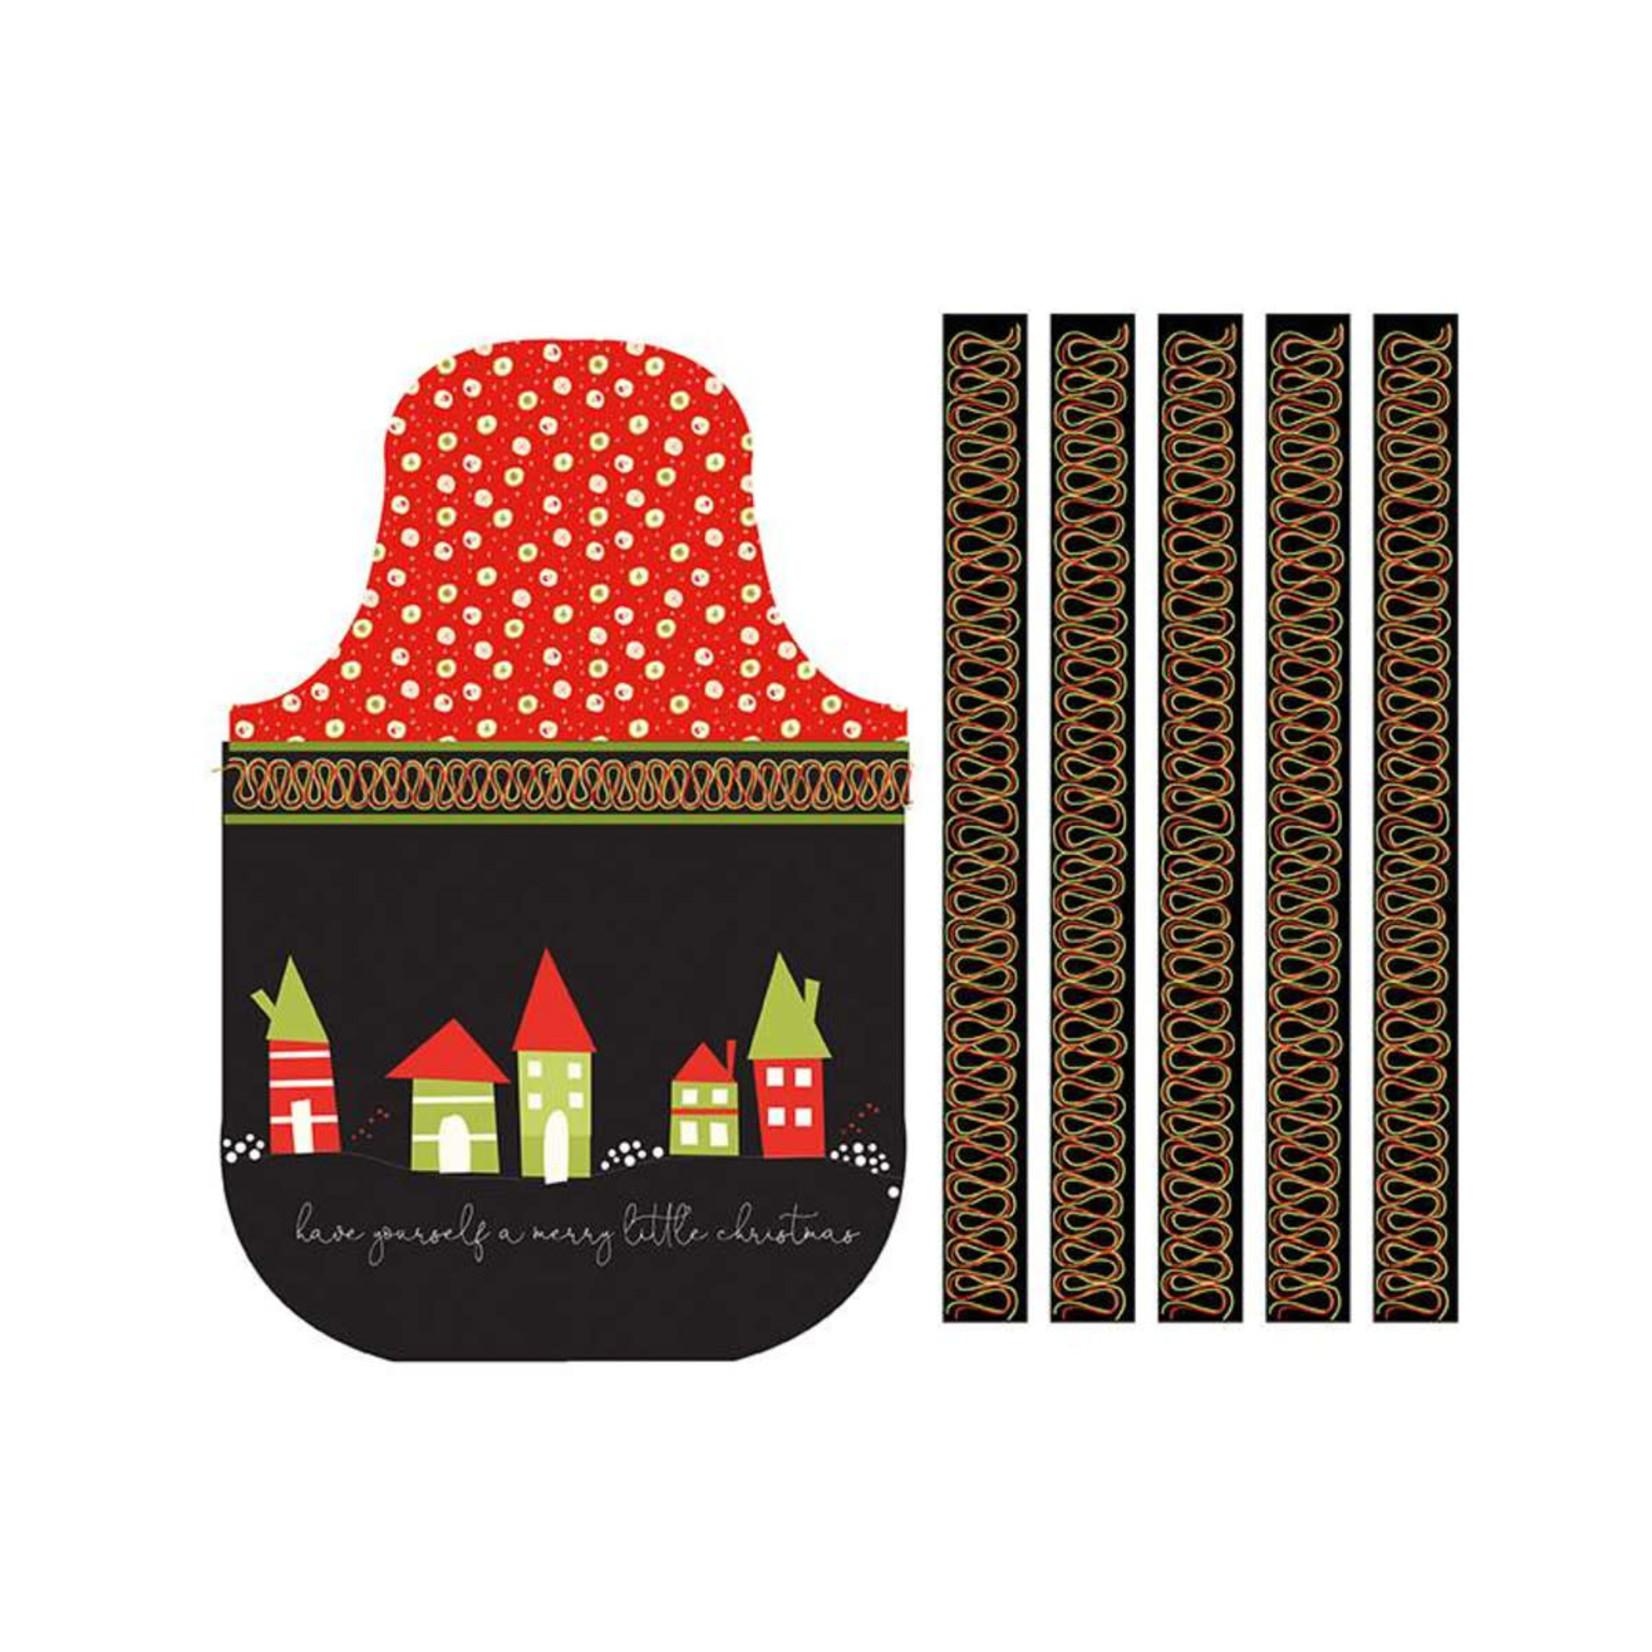 Riley Blake Designs MERRY LITTLE CHRISTMAS, APRON PANEL